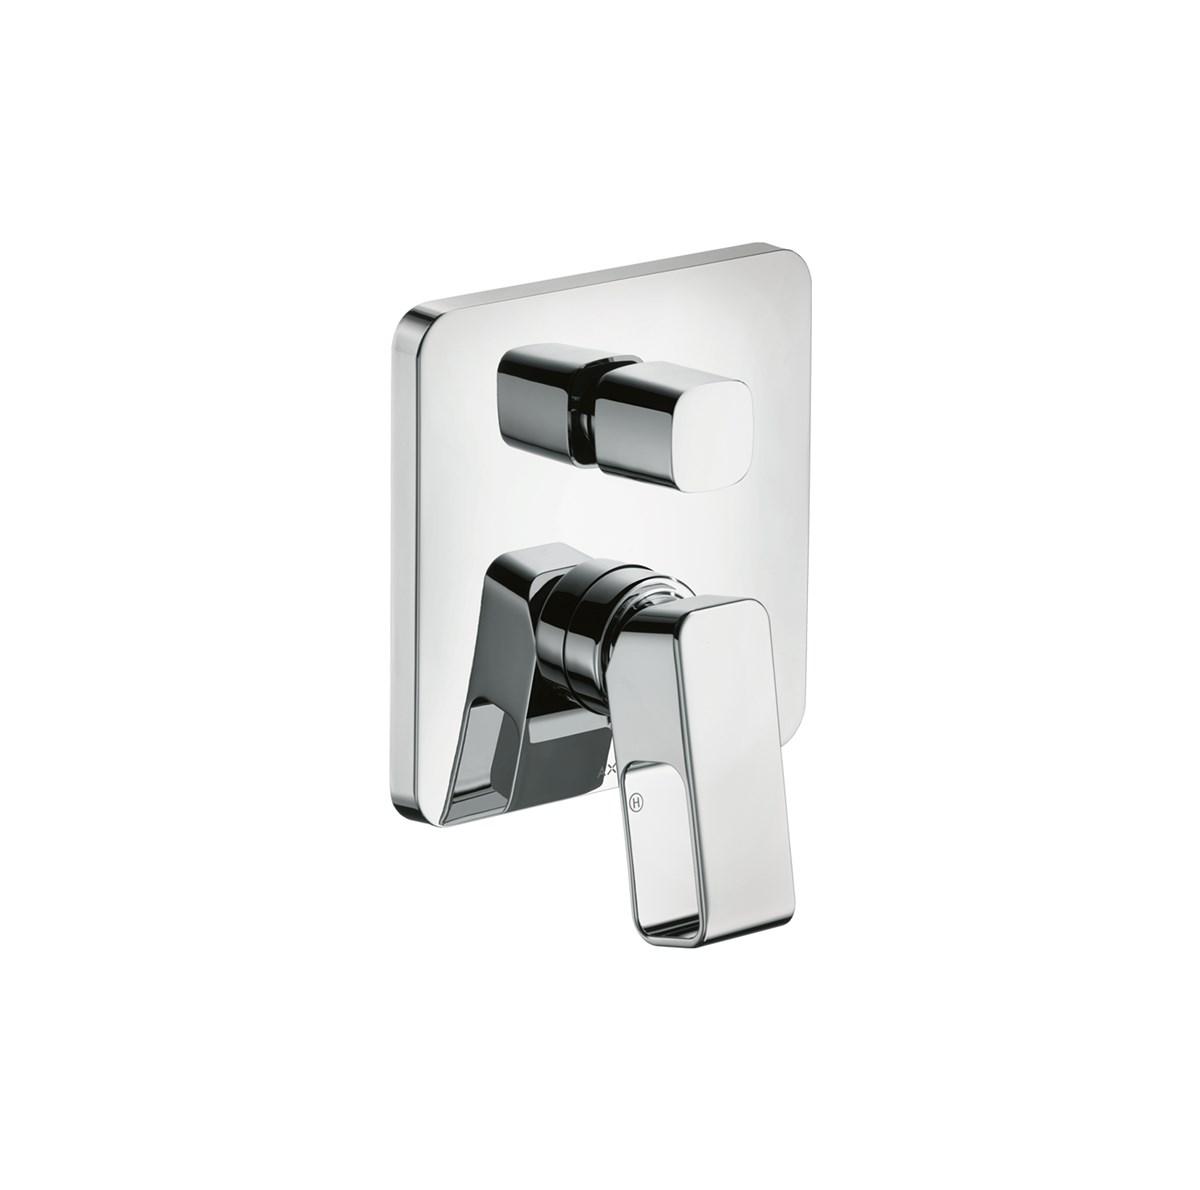 Hansgrohe-Patricia-Urquiola-AXOR-Urquiola-Bath-Mixer-Concealed-11425000-Matisse-1